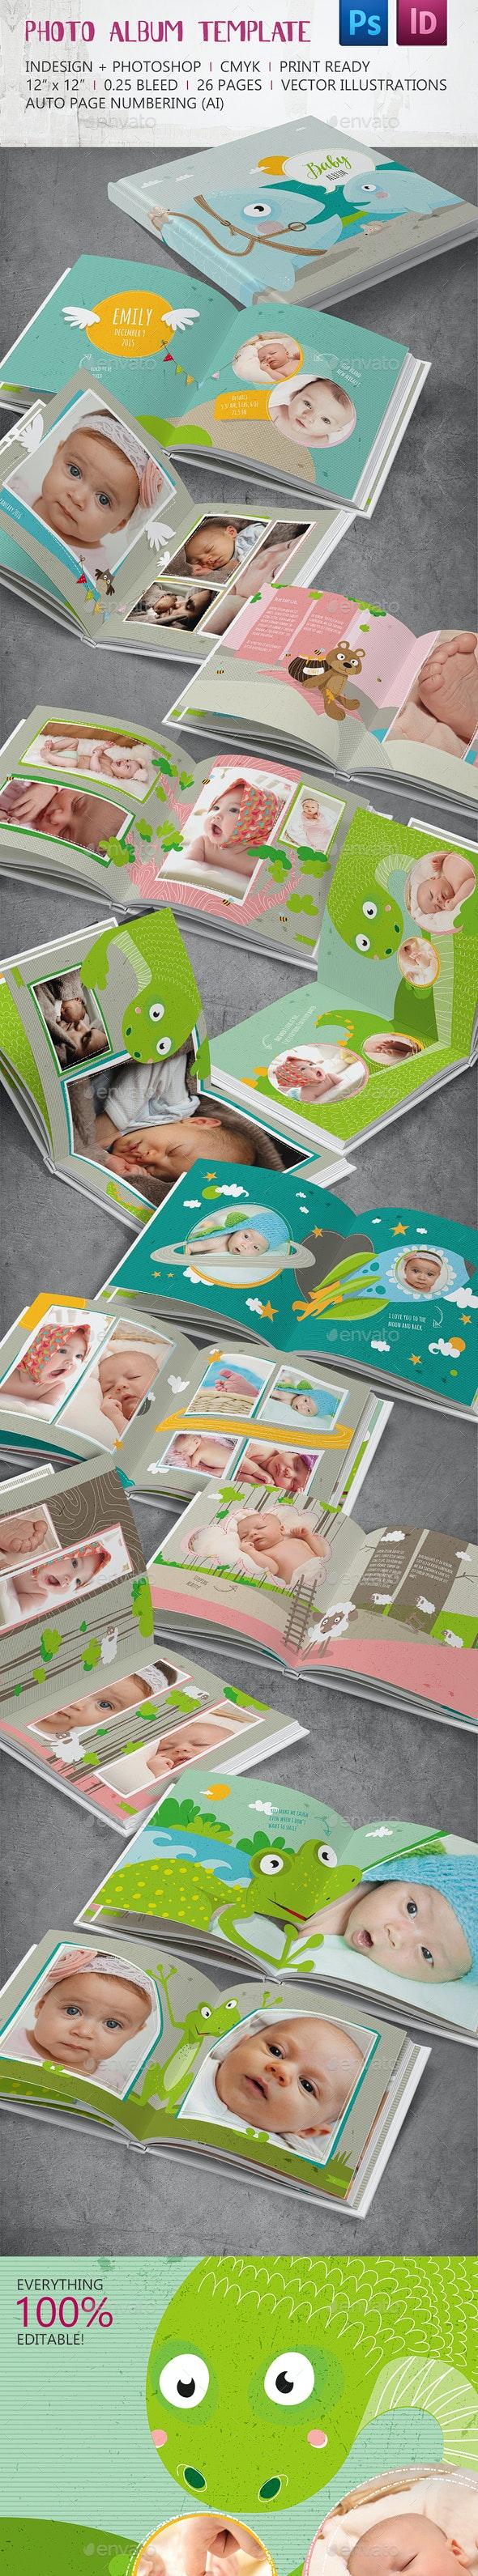 Photo Album Template InD & PSD - Photo Albums Print Templates